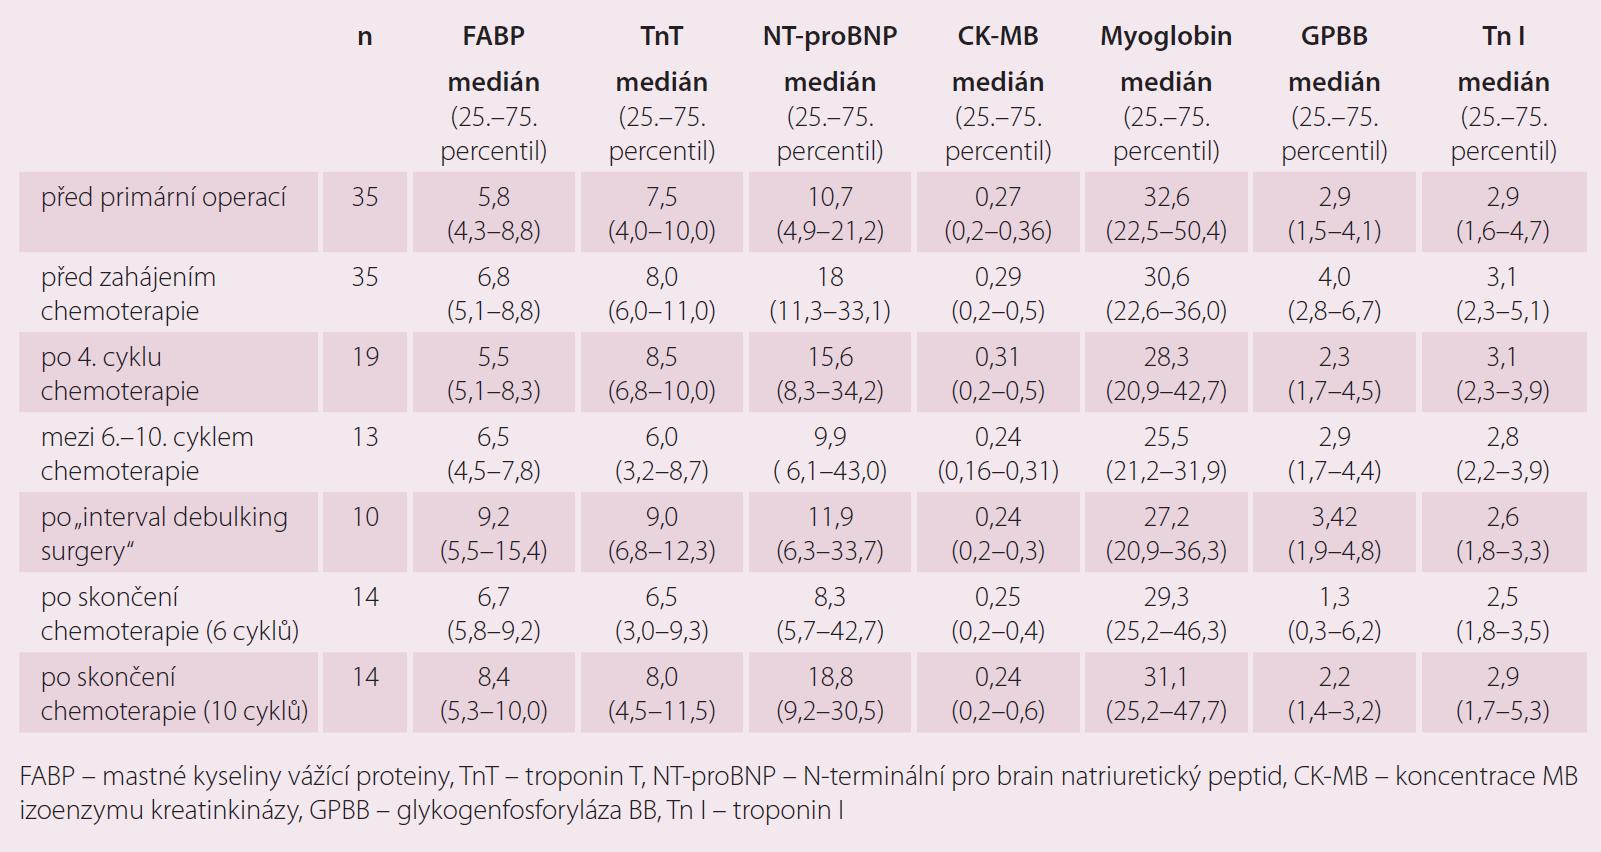 Biochemické markery kardiotoxicity v závislosti na podání chemoterapie 1. linie.